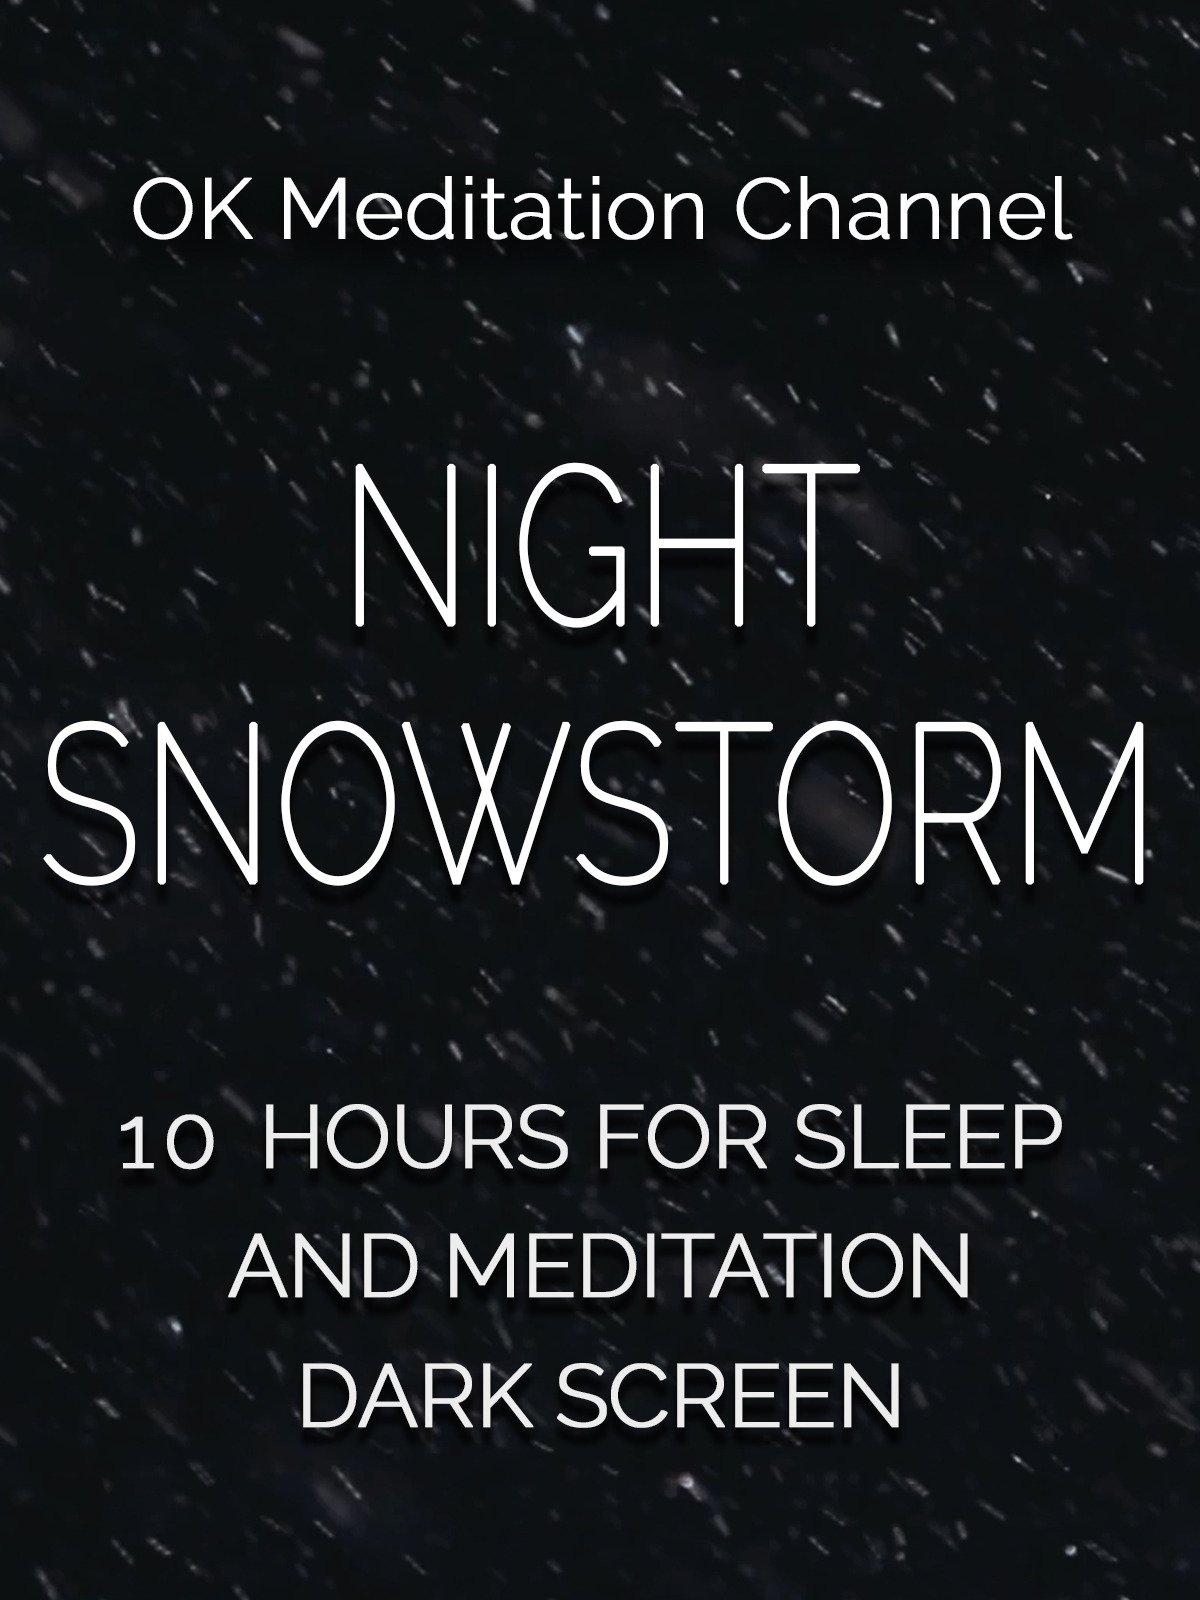 Night snowstorm, 10 hours for sleep and meditation, dark screen